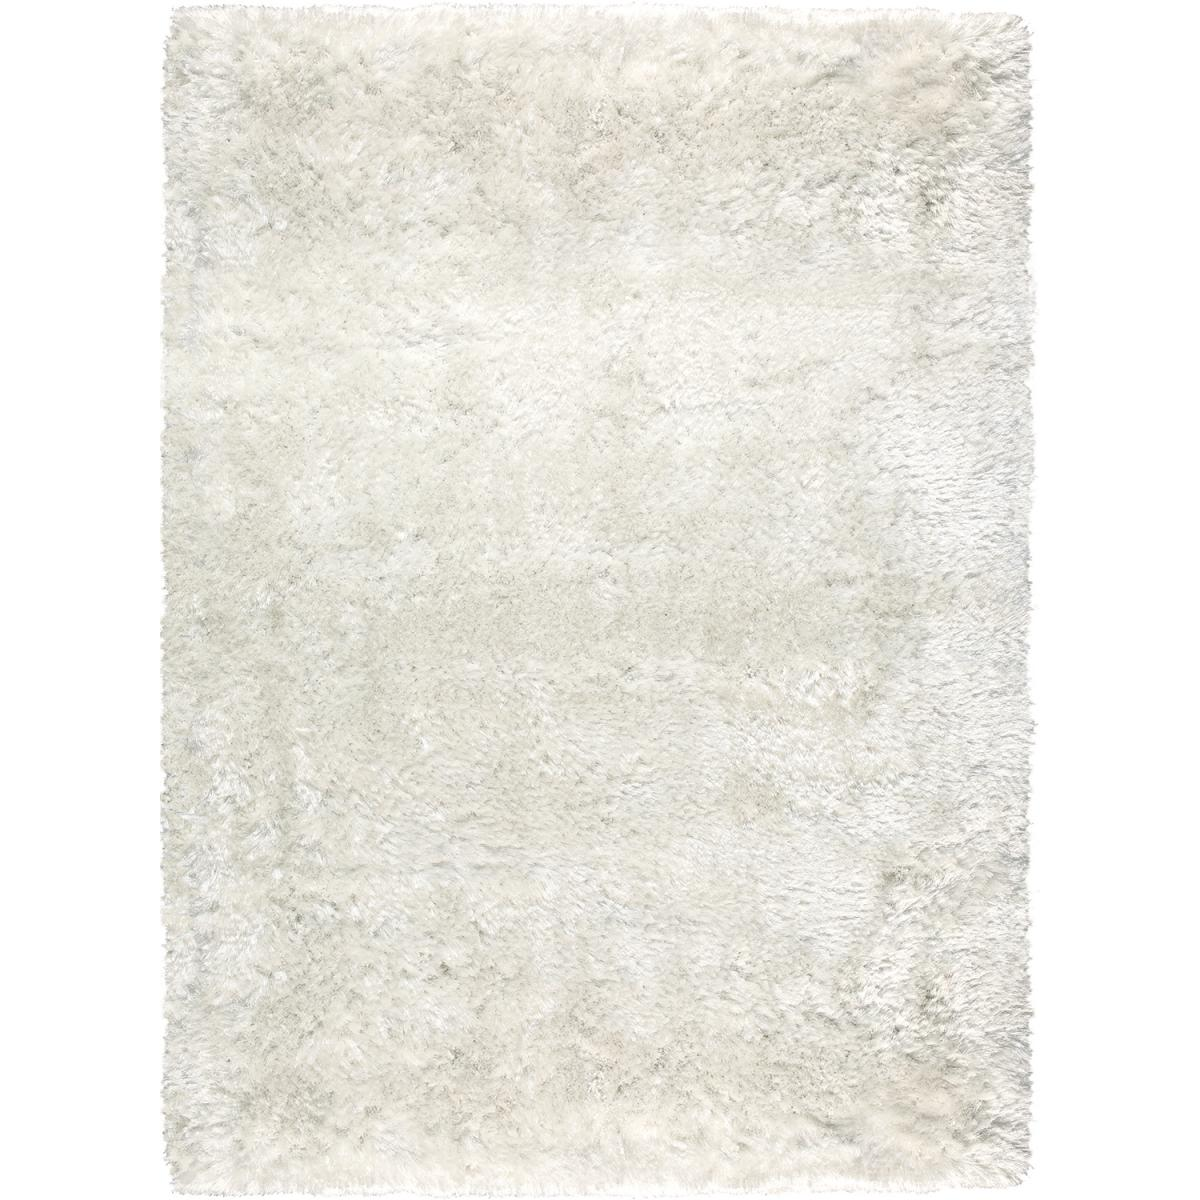 Tapis shaggy poils long en polyester blanc 140x200